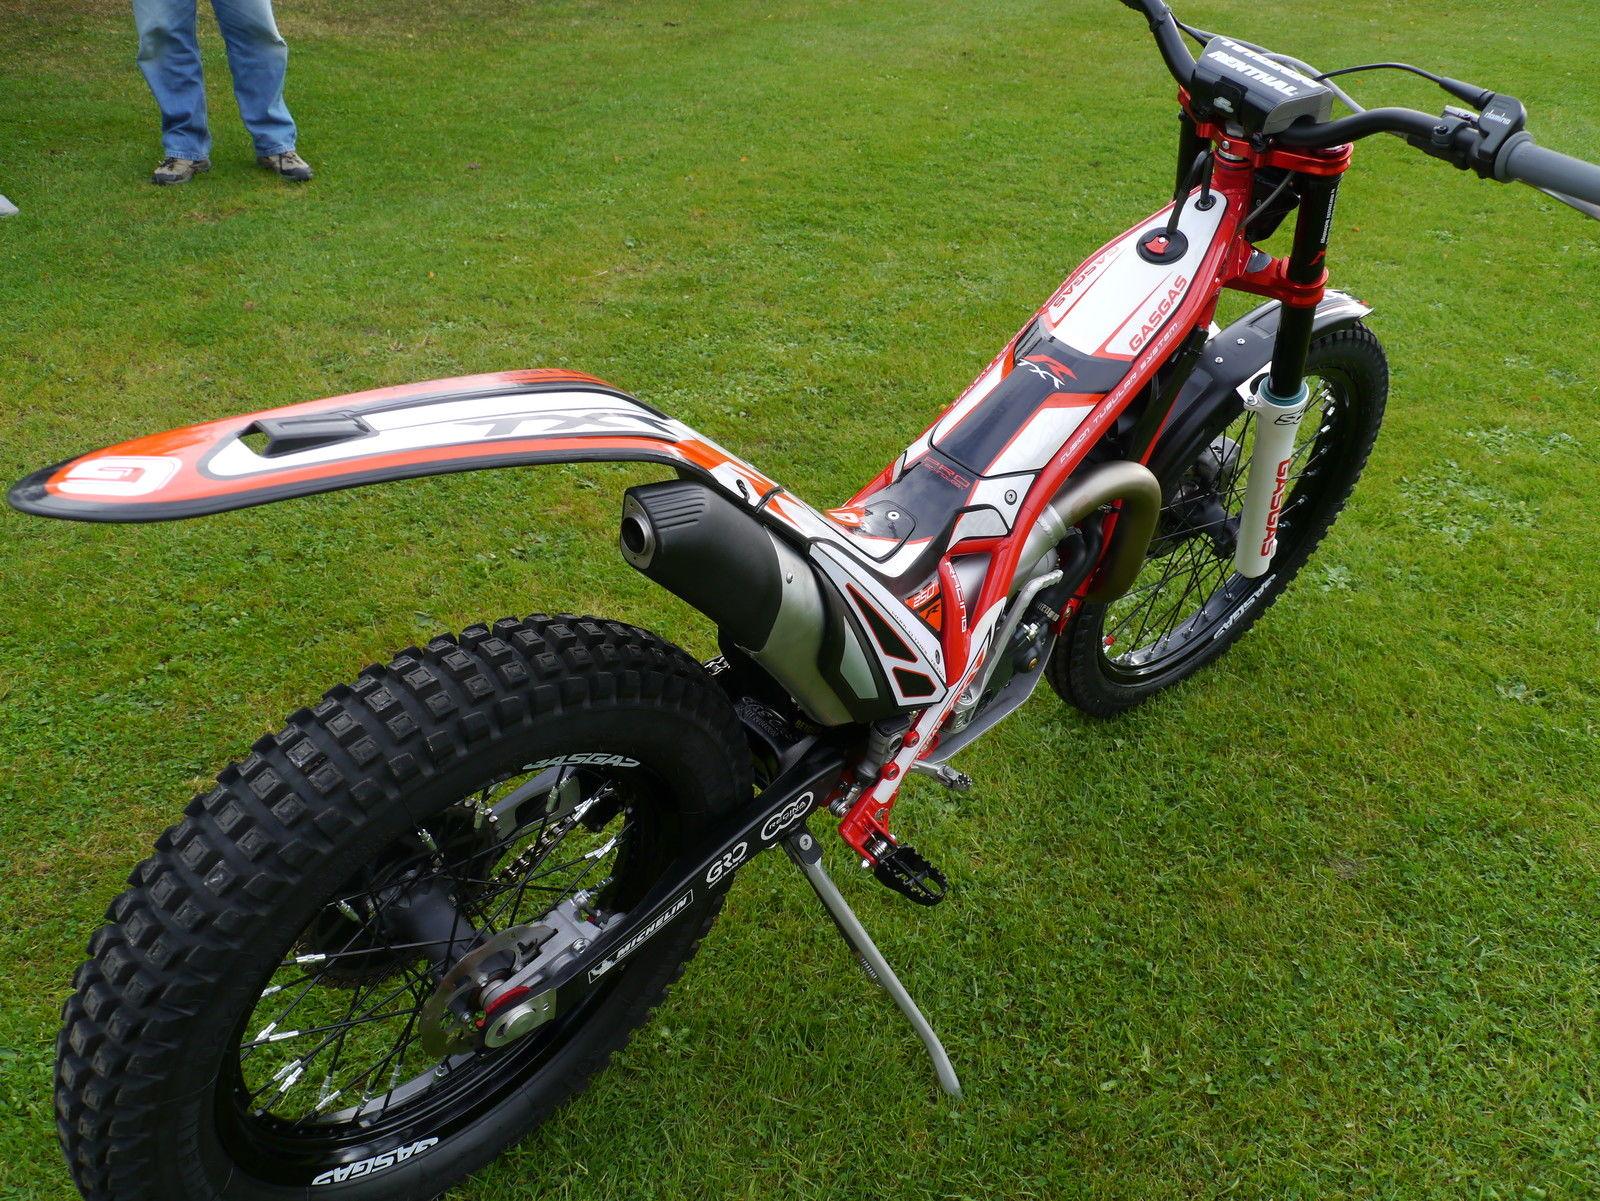 2014 gasgas trials bike 250 txt pro racing special edition model gas gas. Black Bedroom Furniture Sets. Home Design Ideas